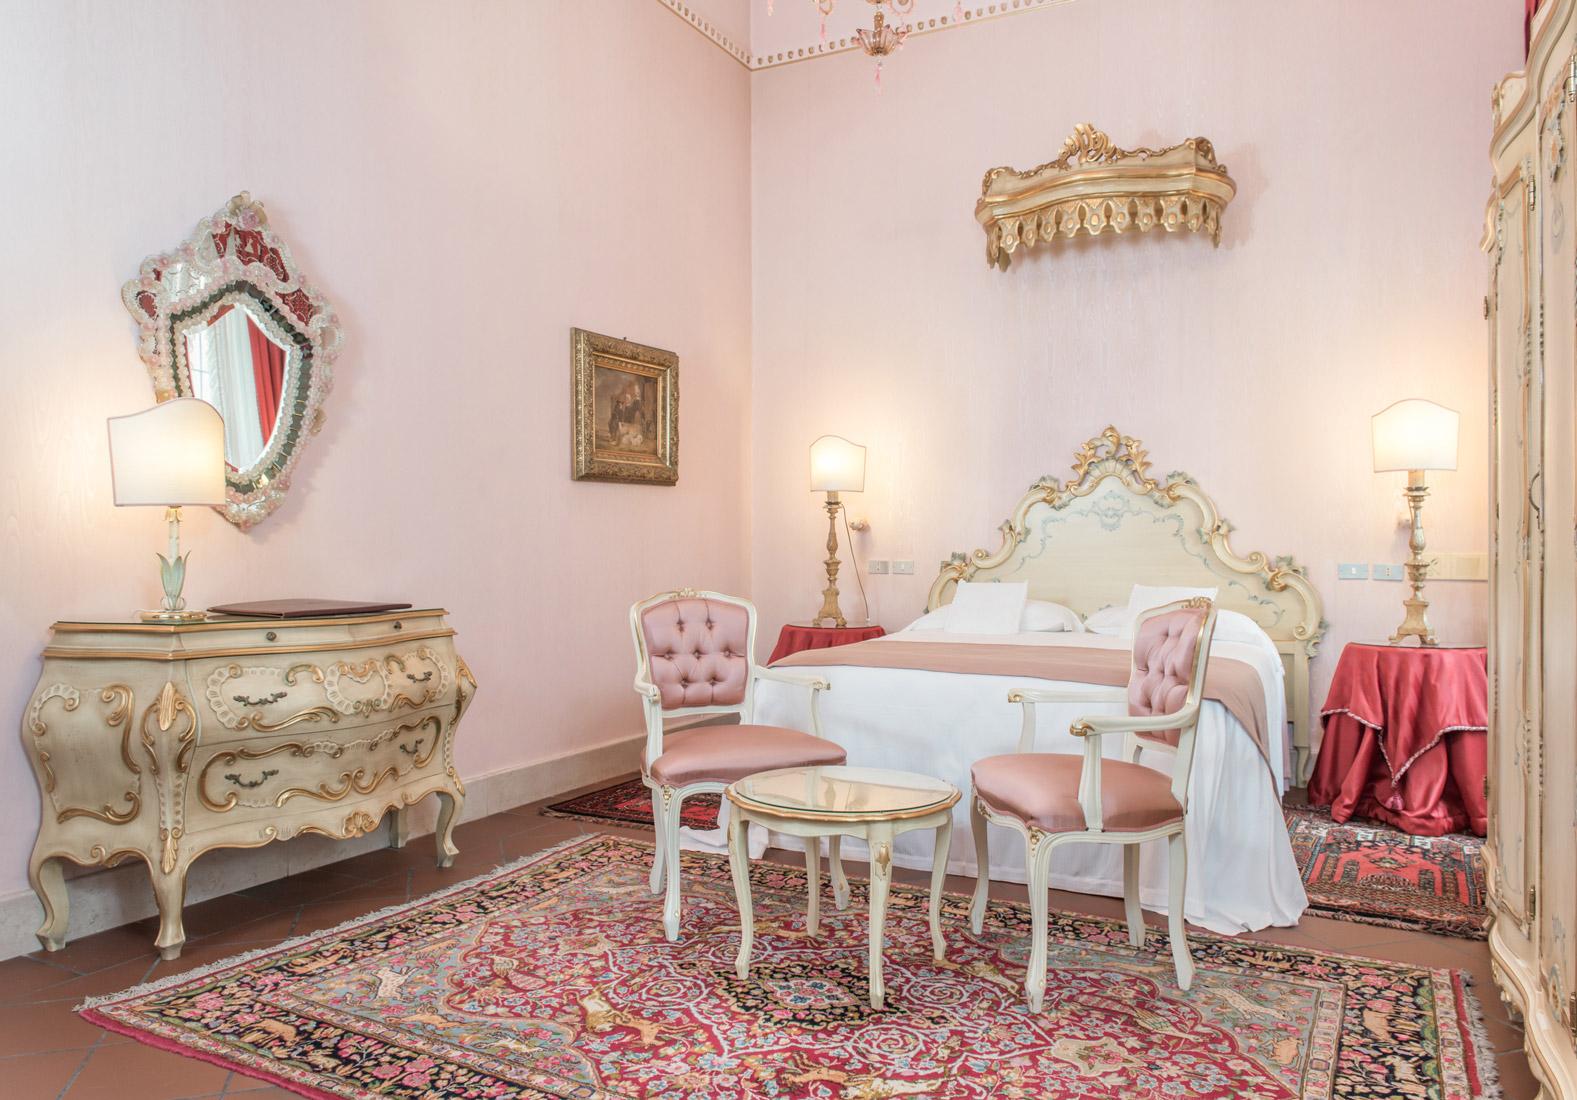 https://www.orlandinifrancesco.com/wp/wp-content/uploads/2019/01/Duchessa-Isabella-Ferrara-Camere-1.jpg